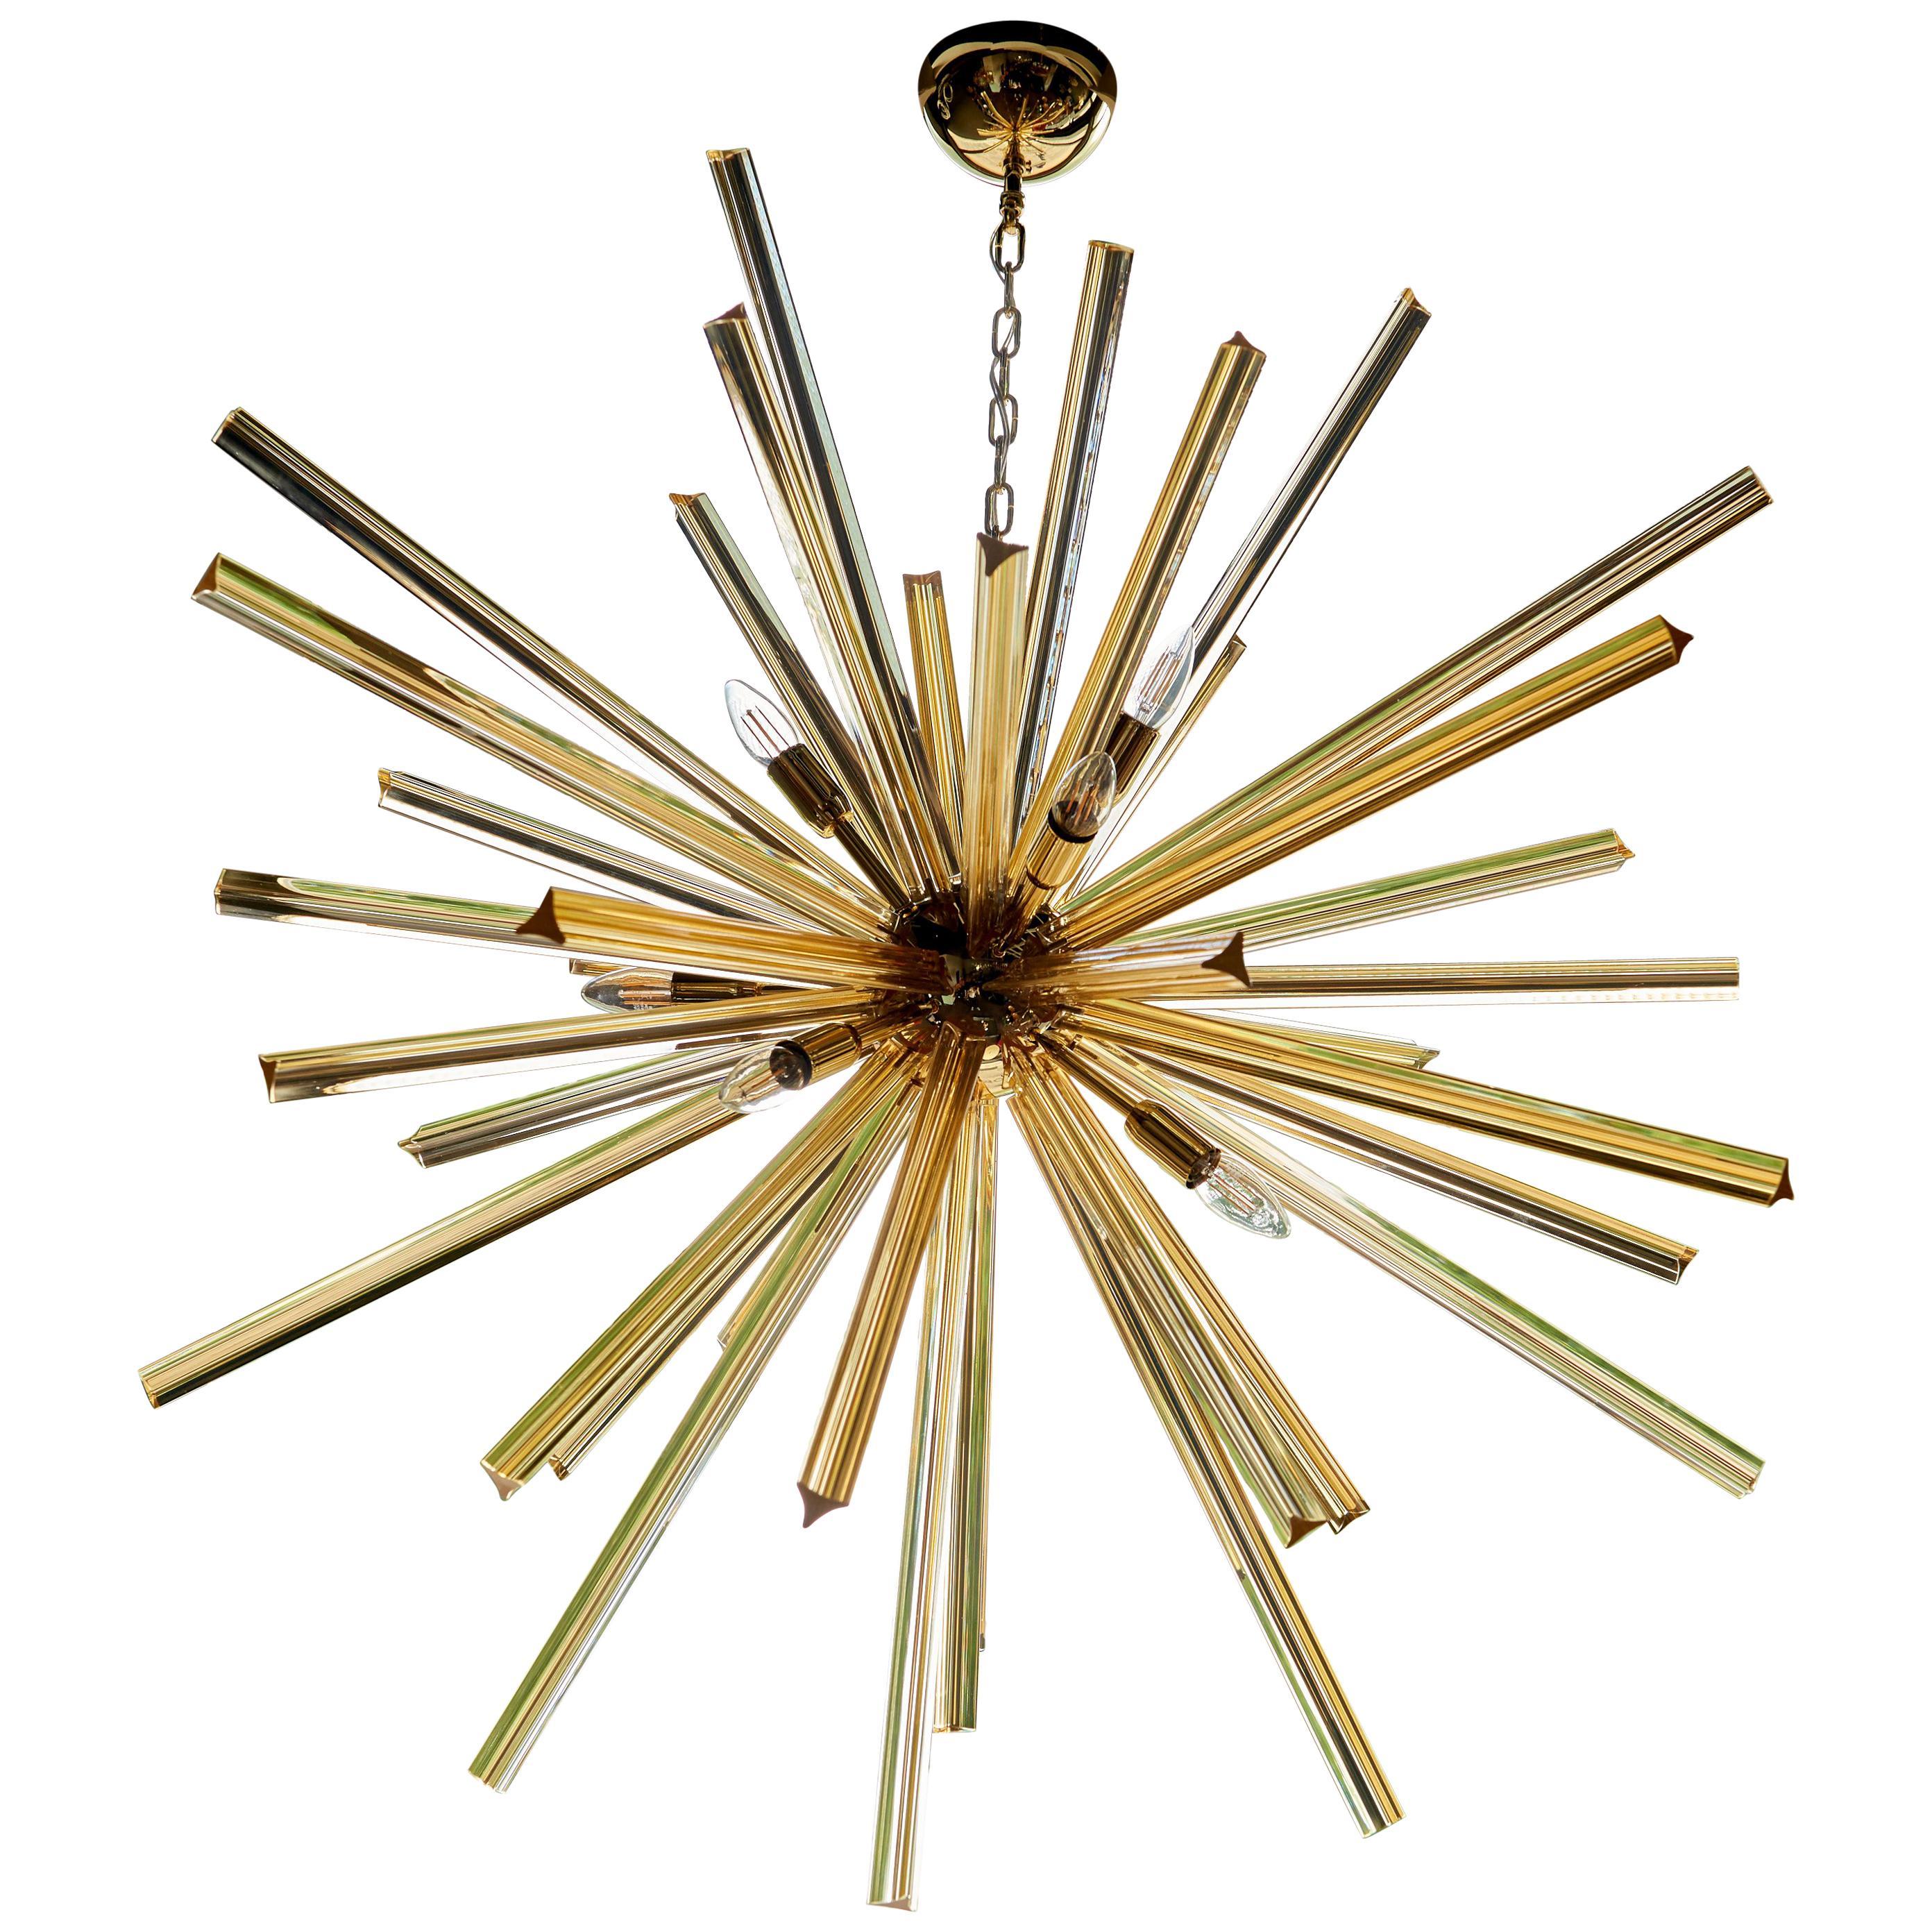 1 or 2 Huge Brass and Amber Murano Glass Sputnik Chandelier Venini Style